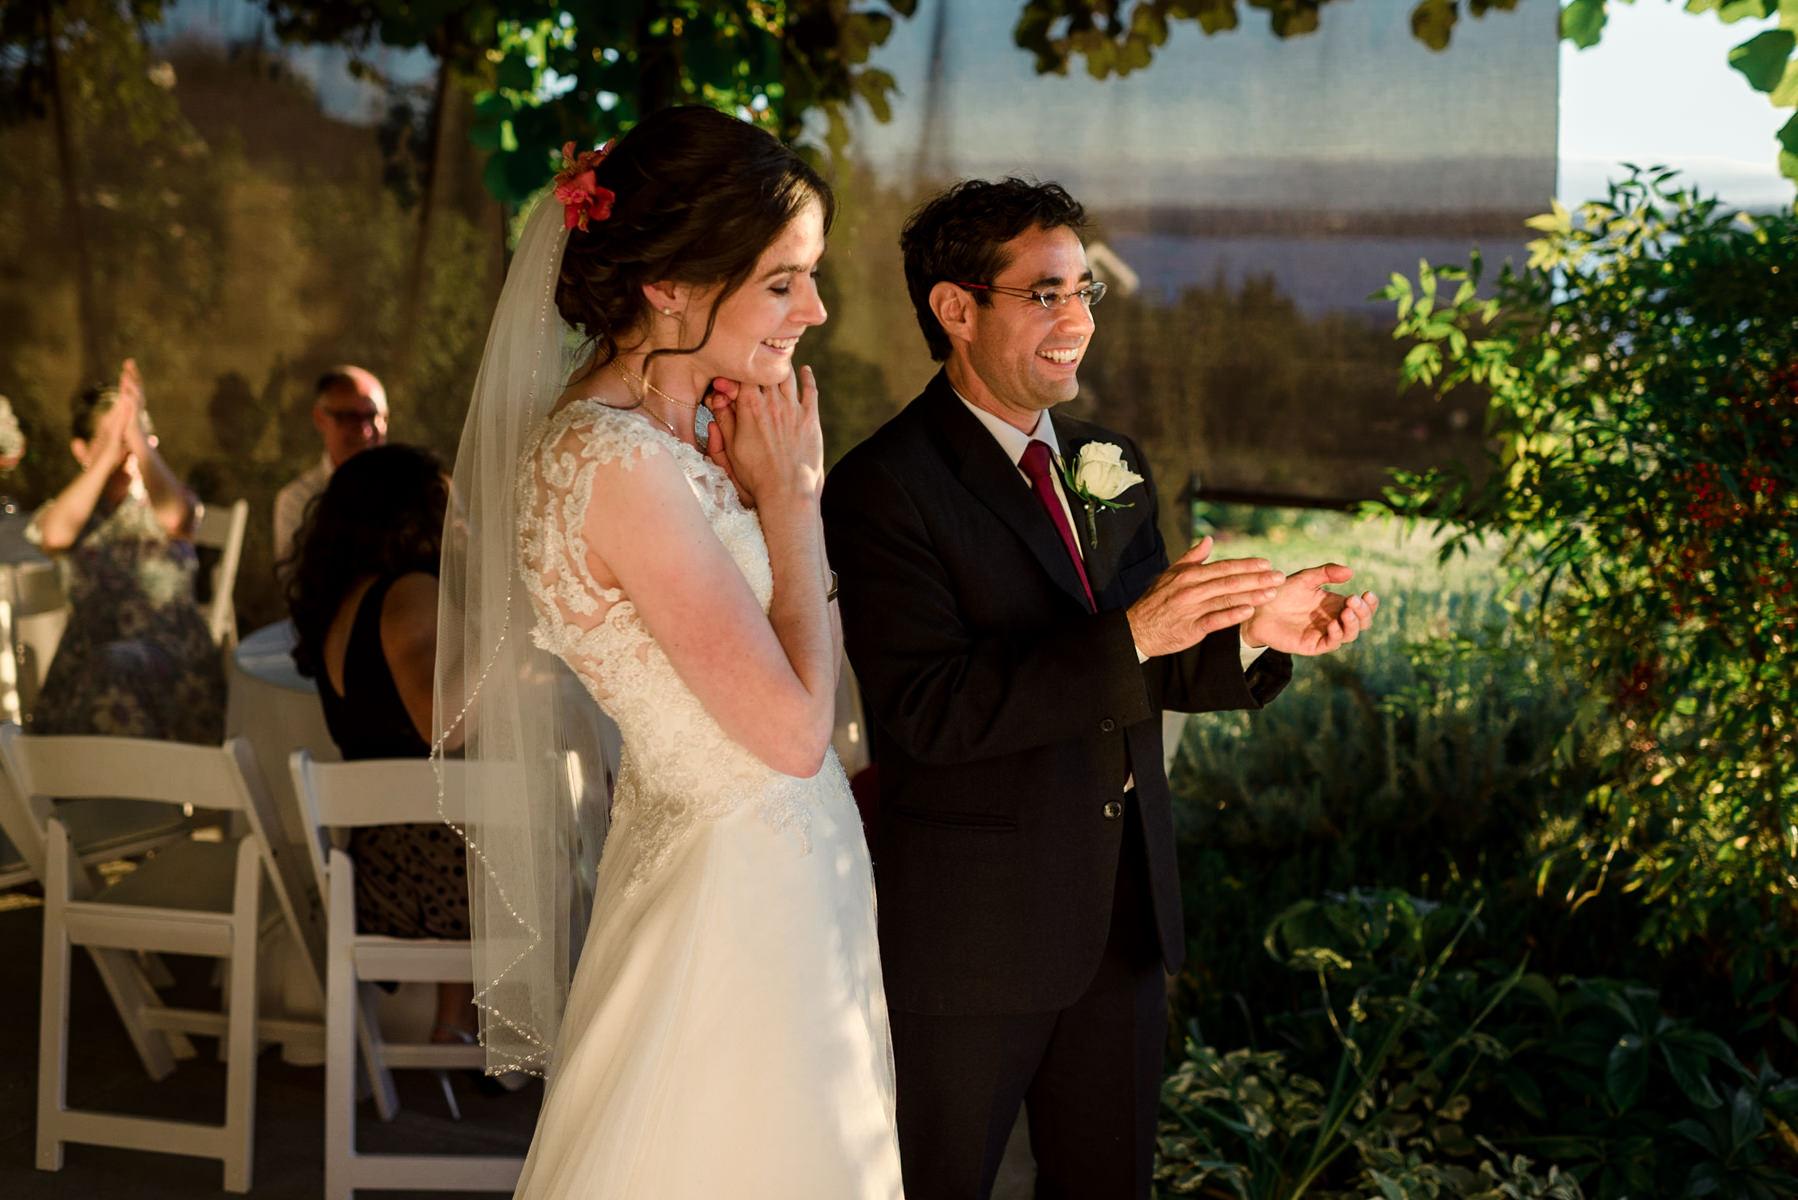 Andrew Tat - Documentary Wedding Photography - Kirkland, Washington - Emily & Cuauh - 48.JPG